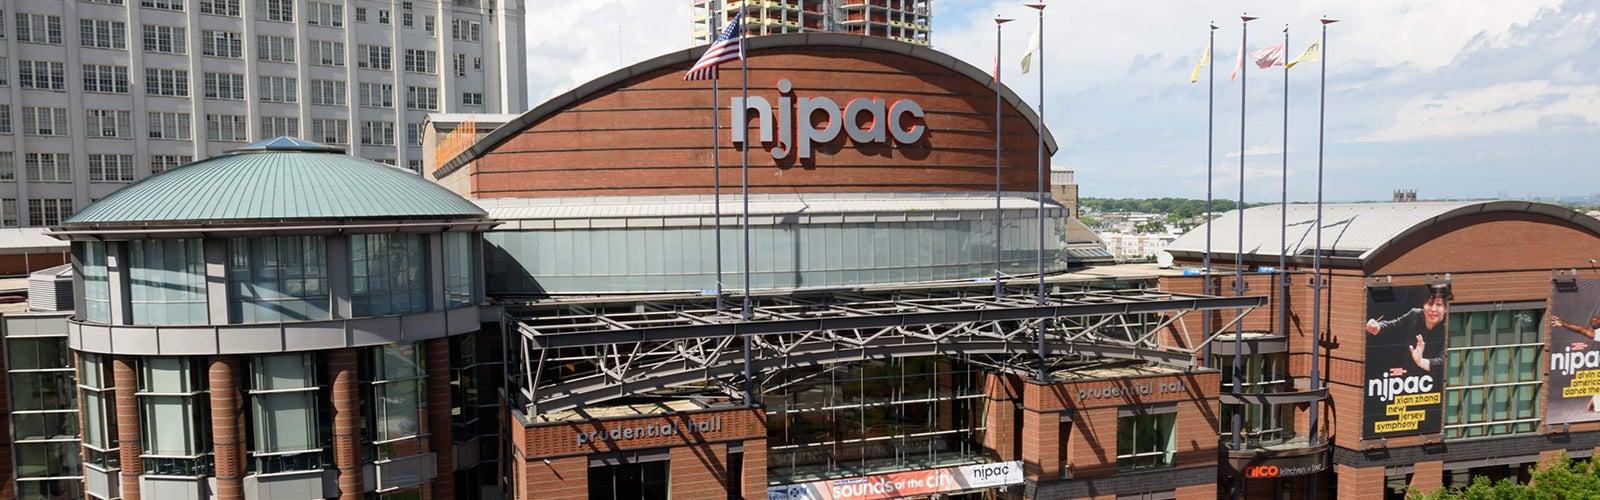 NJPAC-exterior-1600x500.jpg